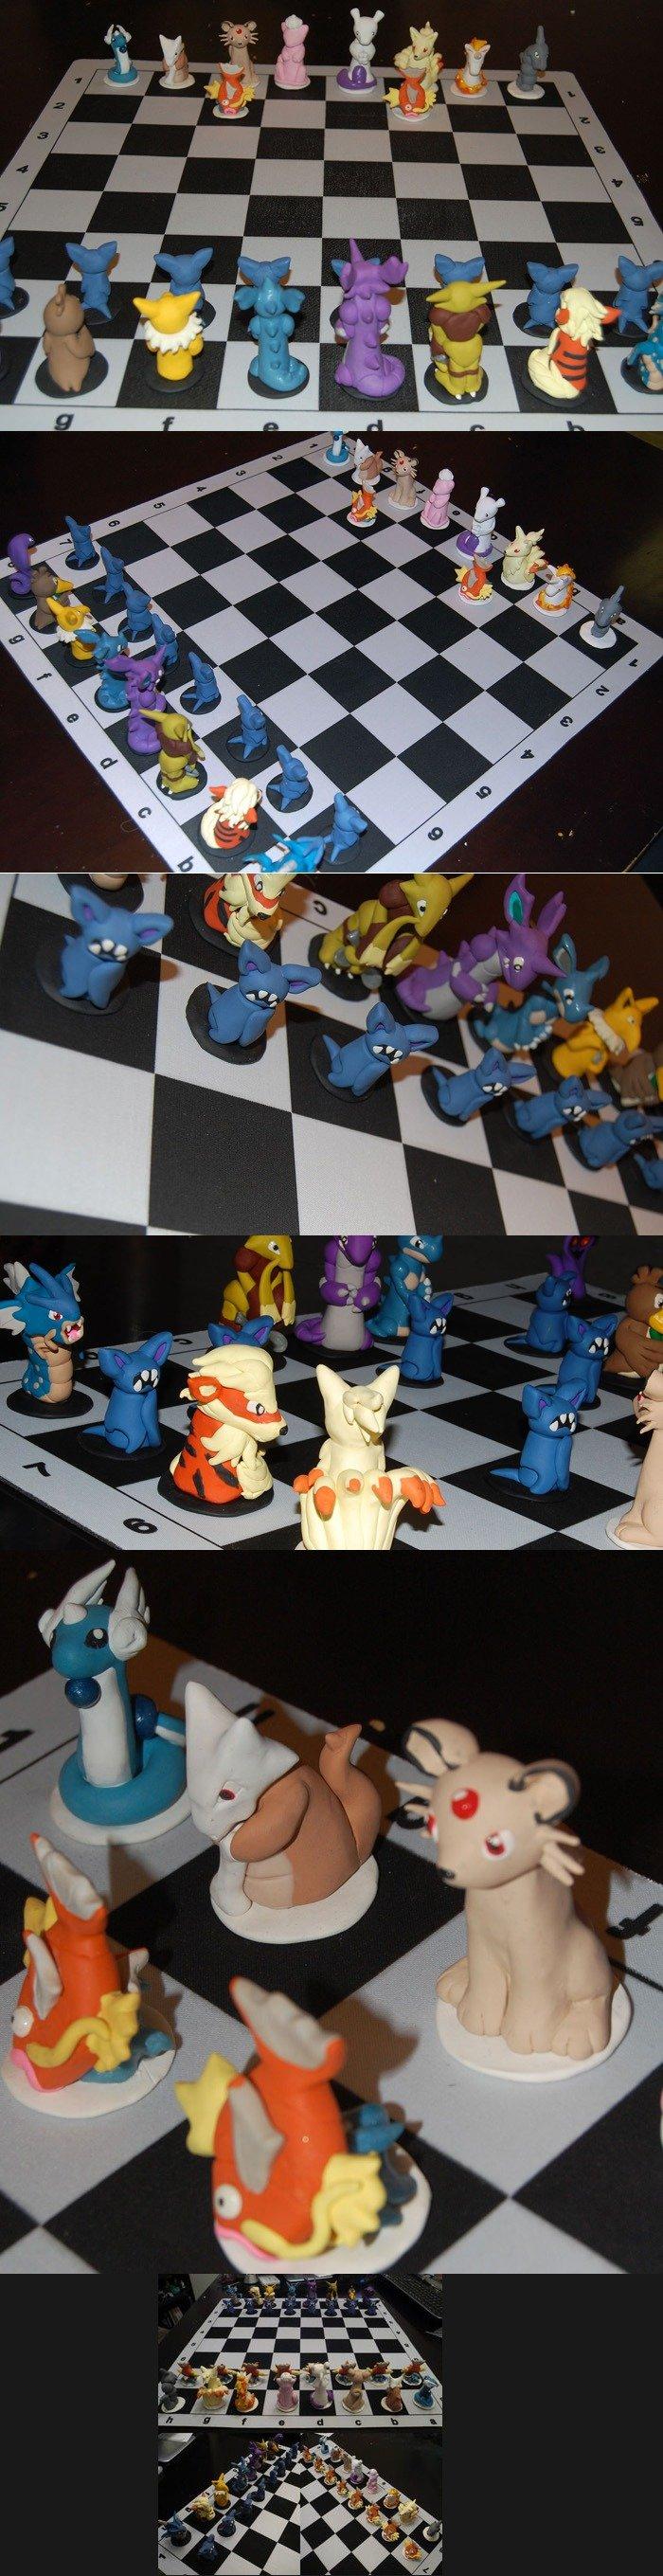 Pokemon chess anyone?. Someone suggested I upload a Pokemon theme chess, or possibly a Pokemon Lego theme chess board. If they meant Pokemon Lego bricks... I ca Pokemon chess